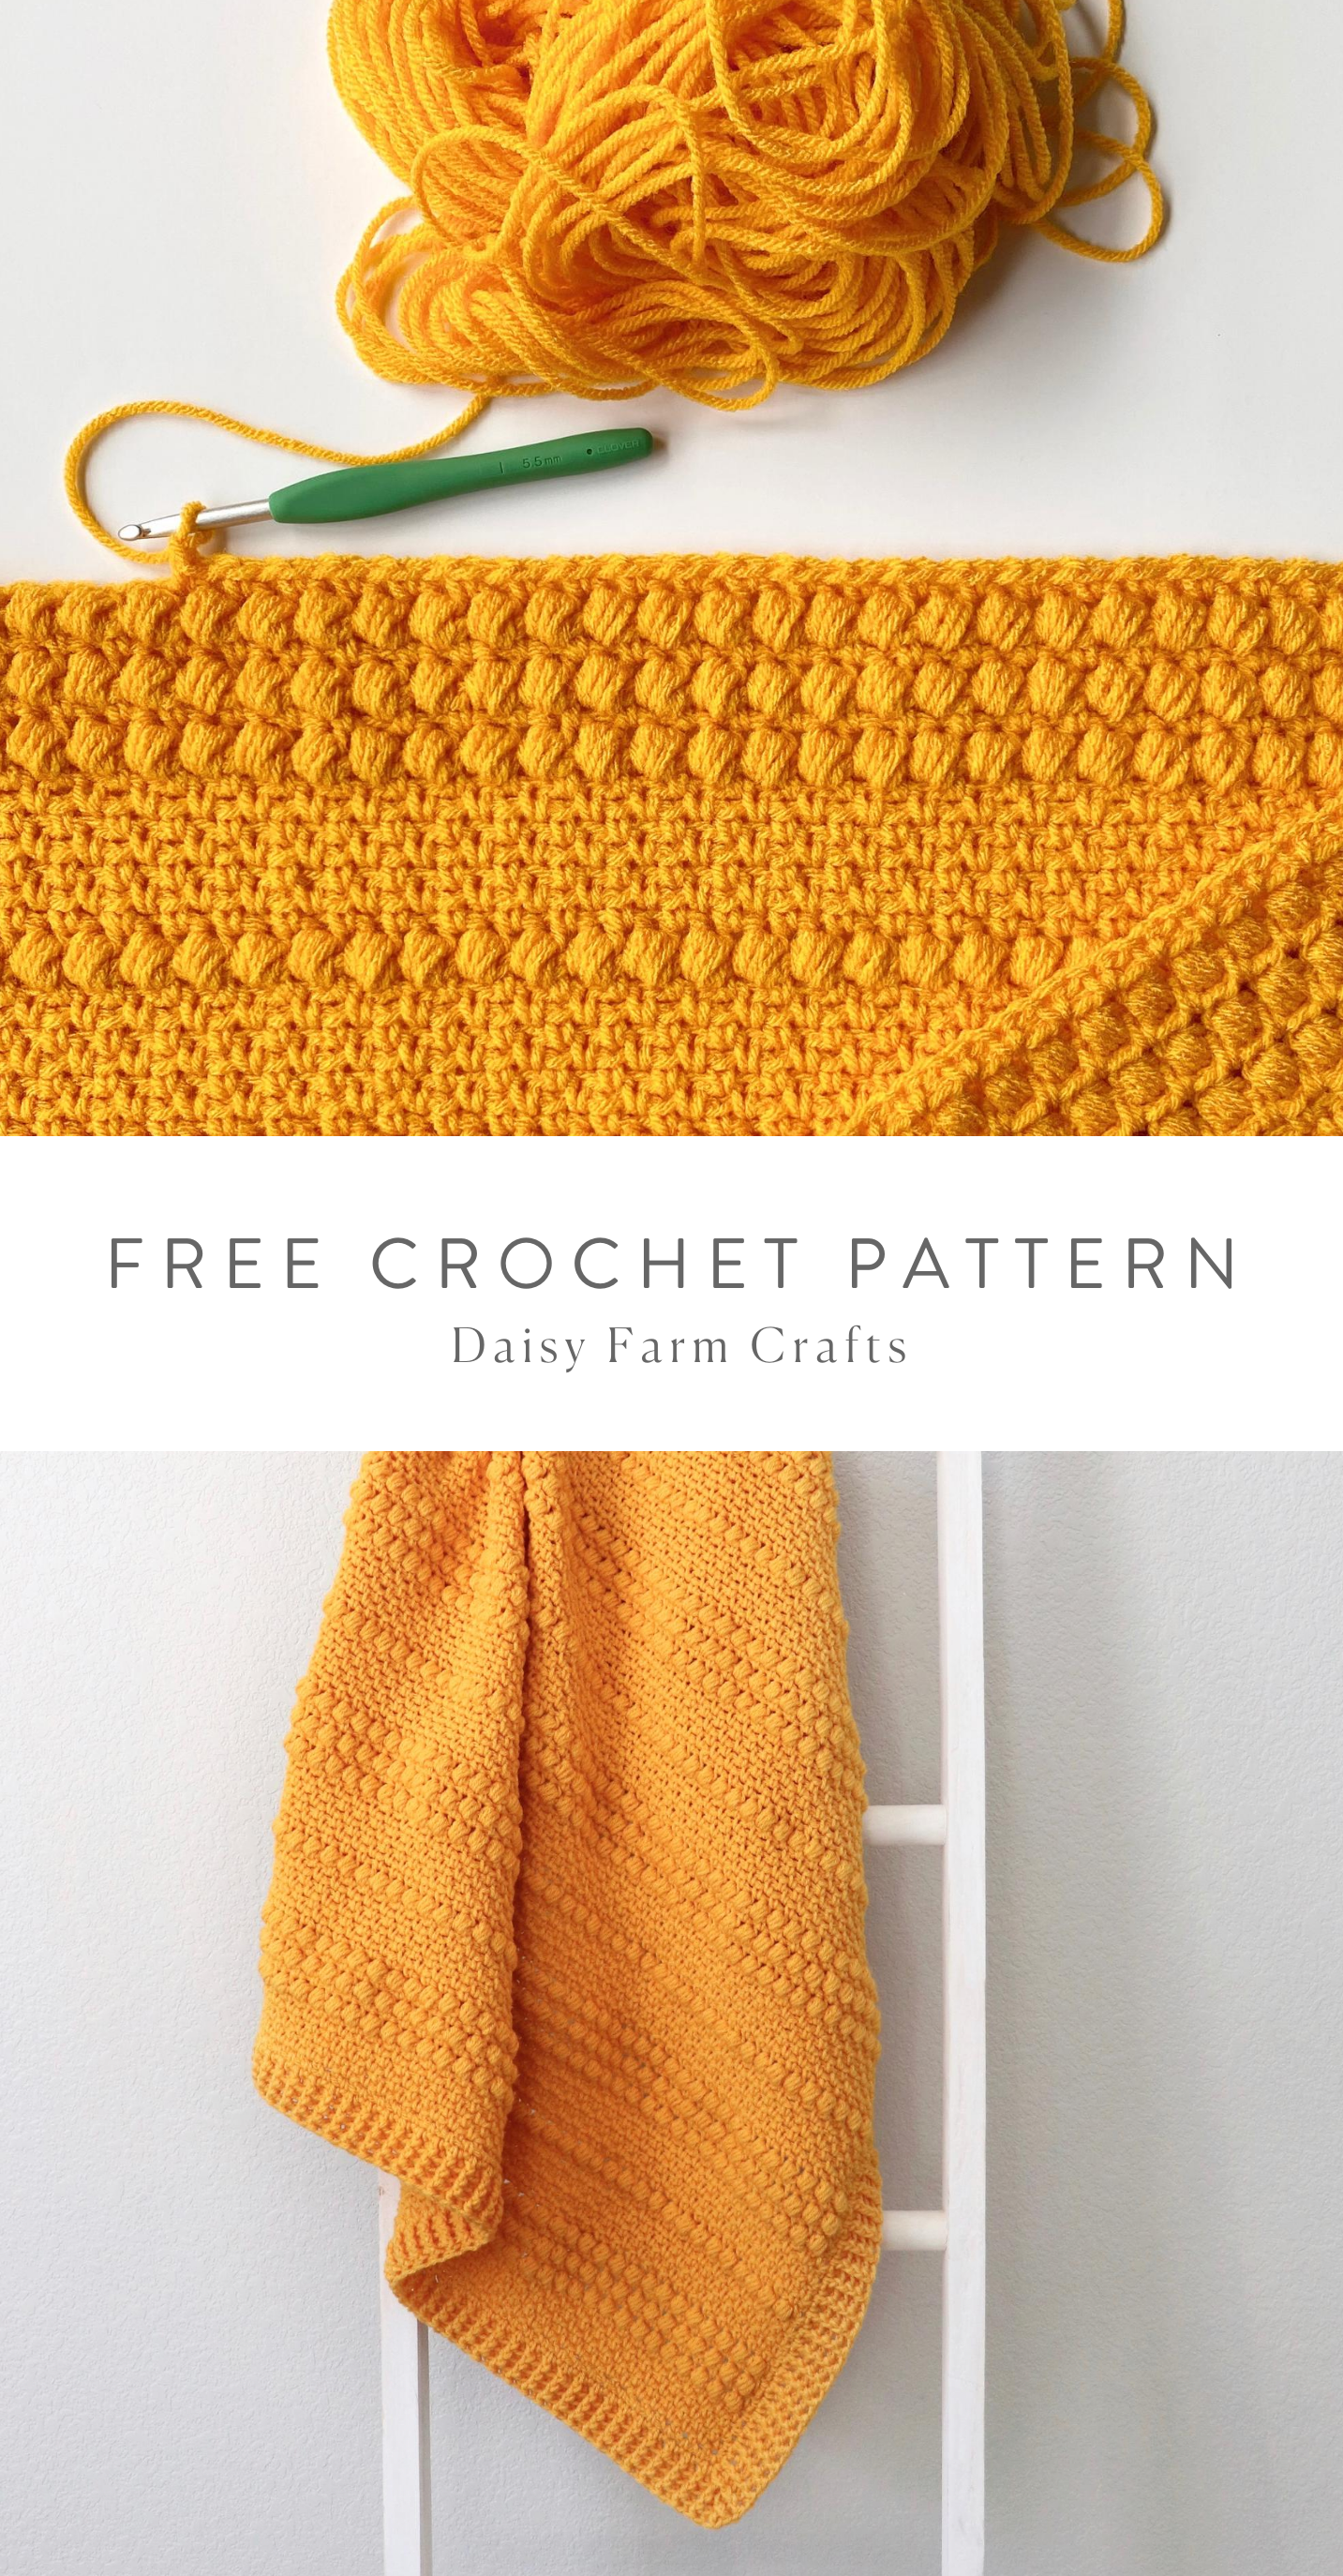 Free Pattern – Crochet Gold Puffs Baby Blanket